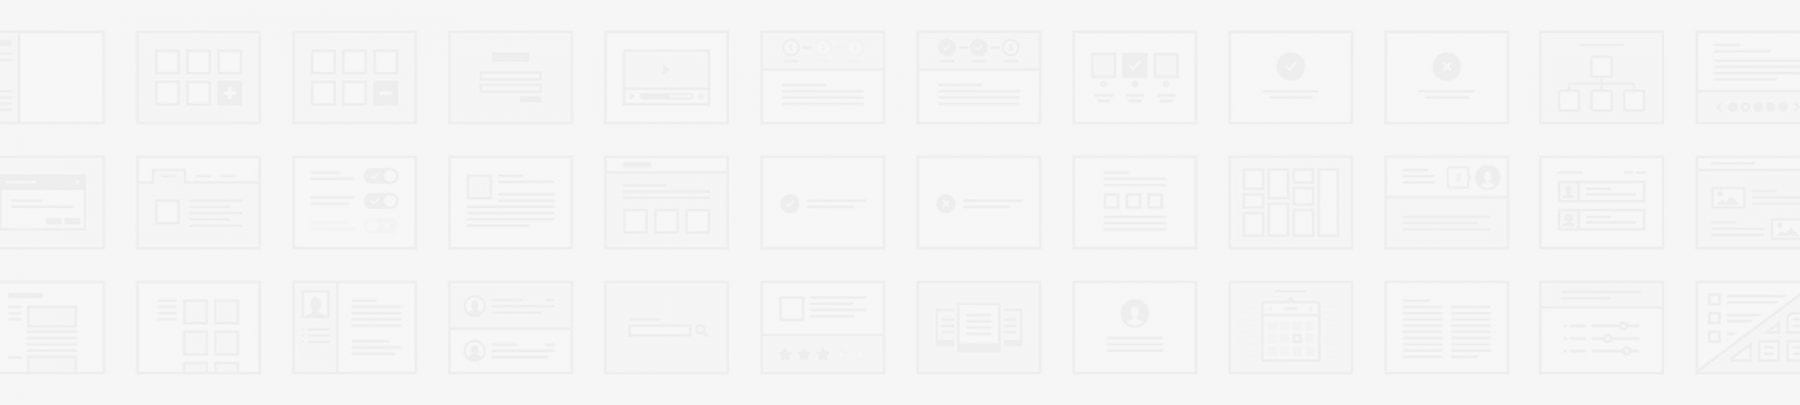 layouts-slide.jpg